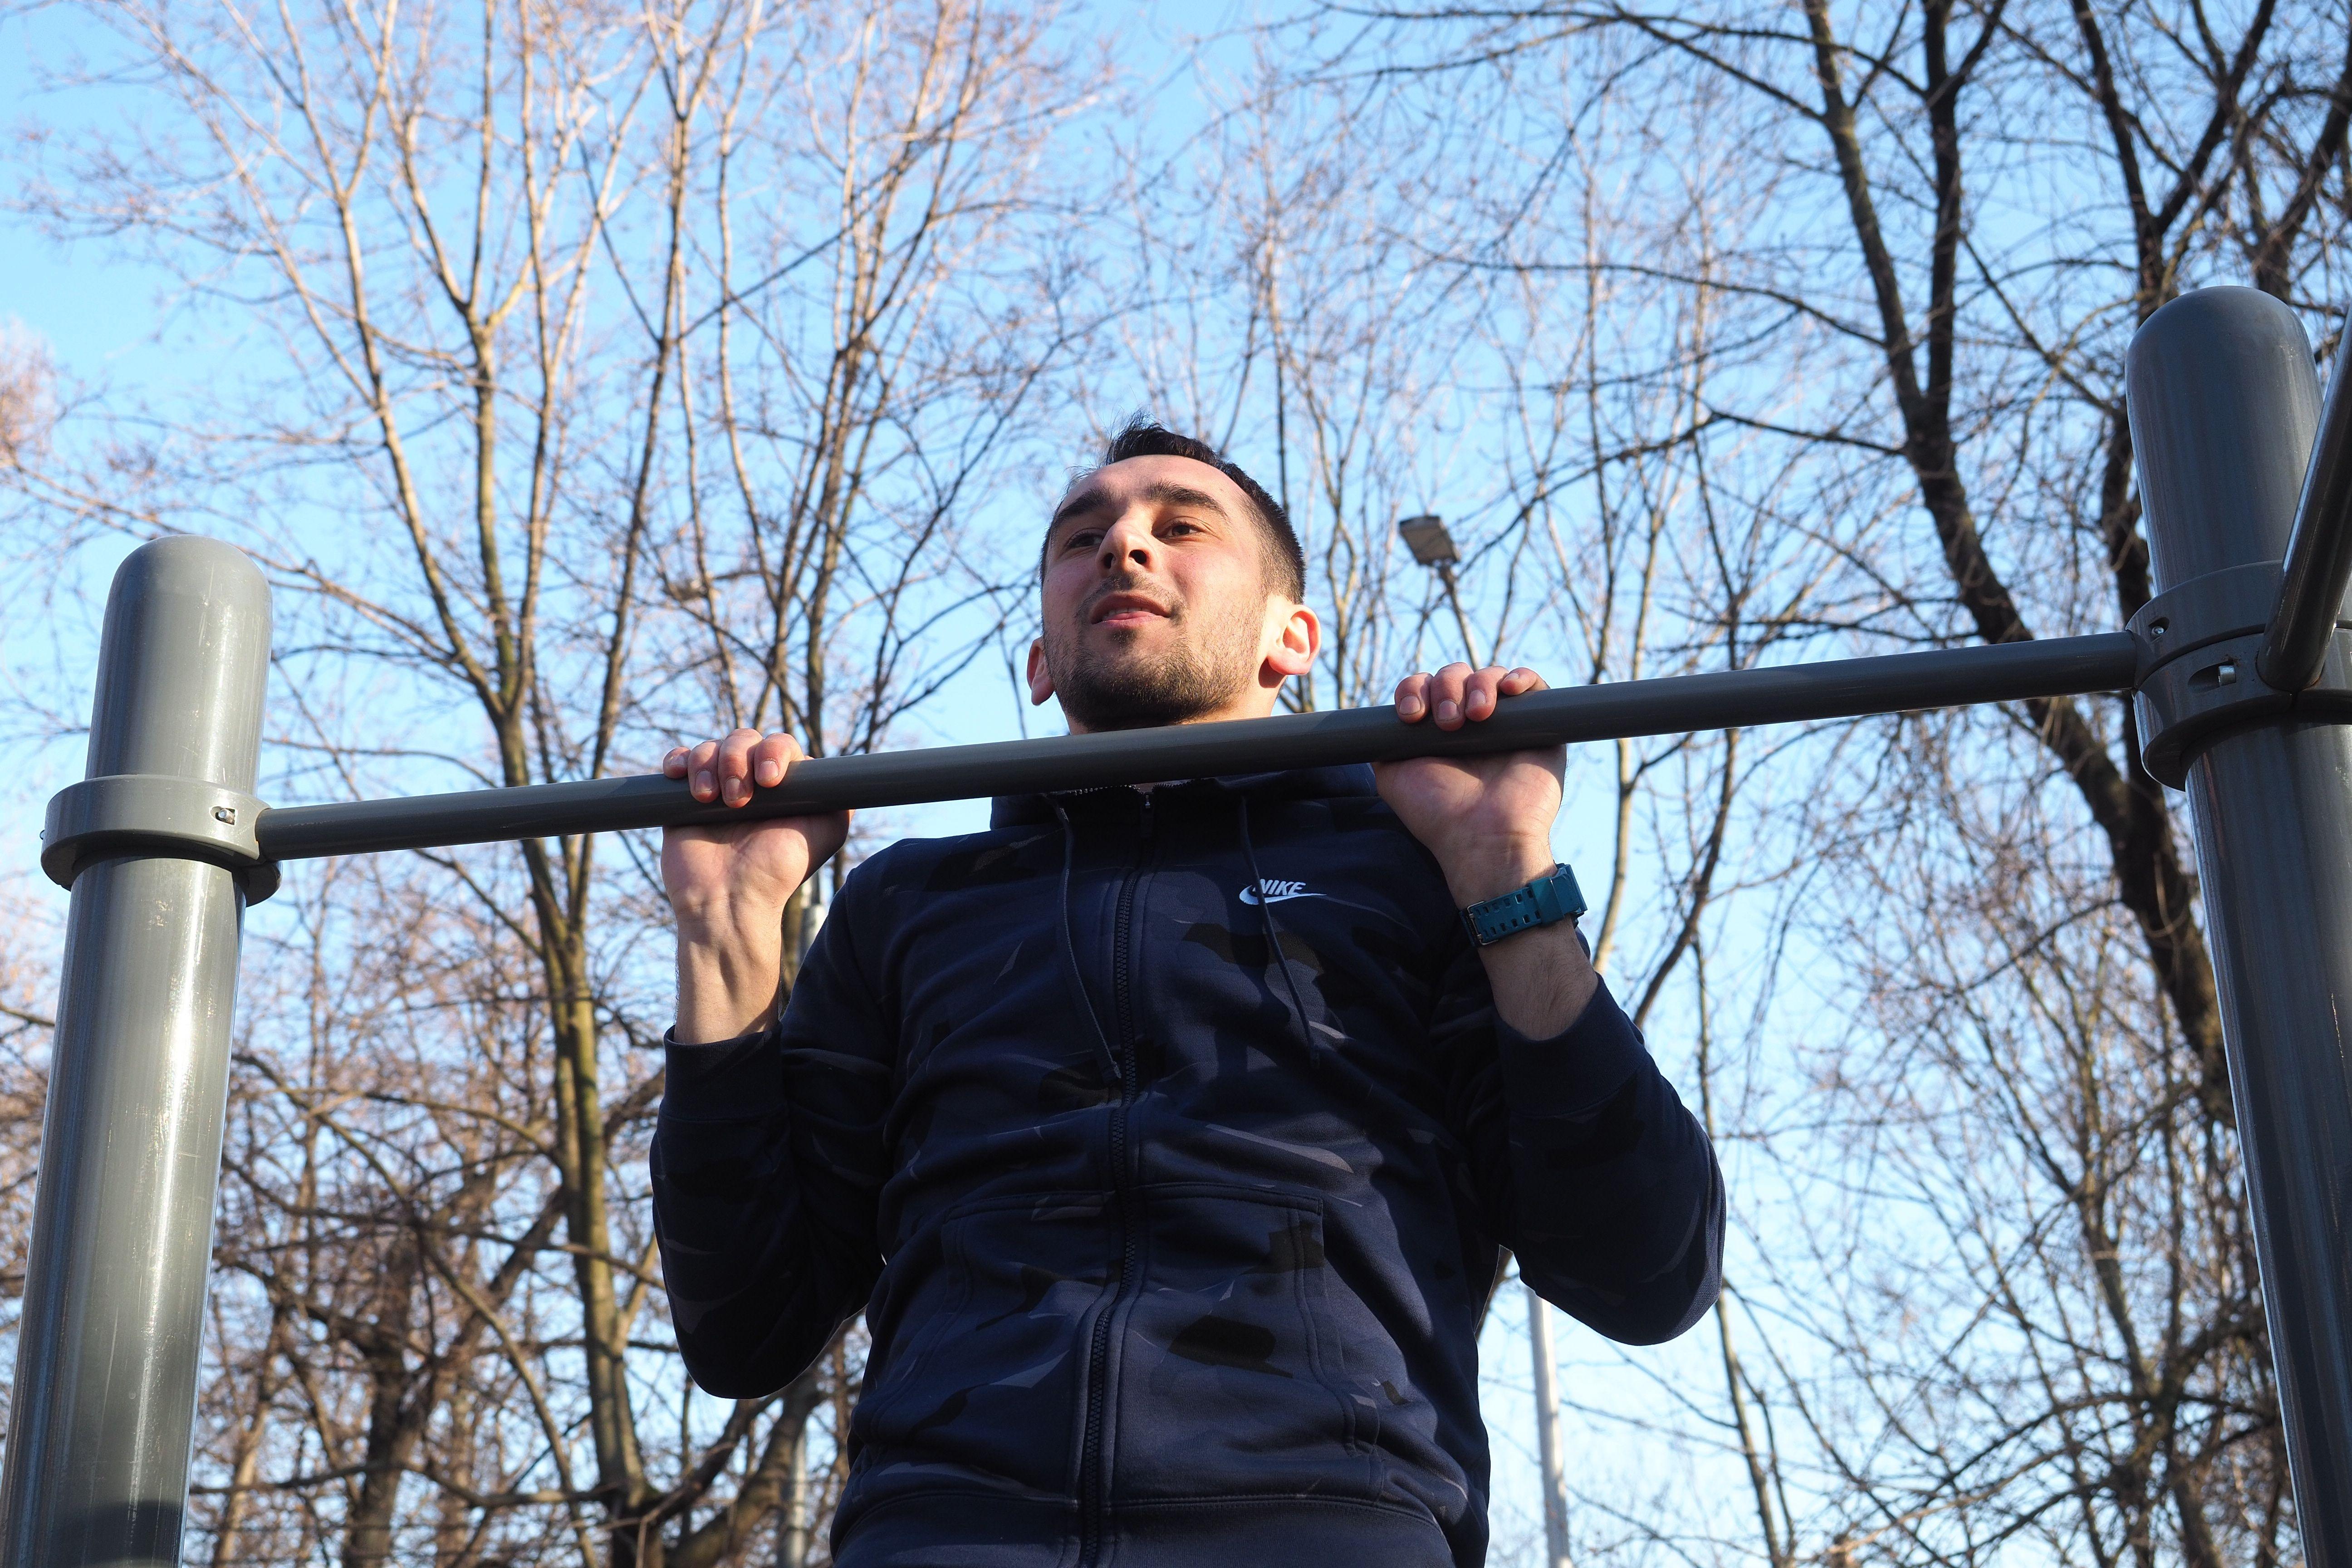 Москвичи решат, каким спортом заниматься на свежем воздухе